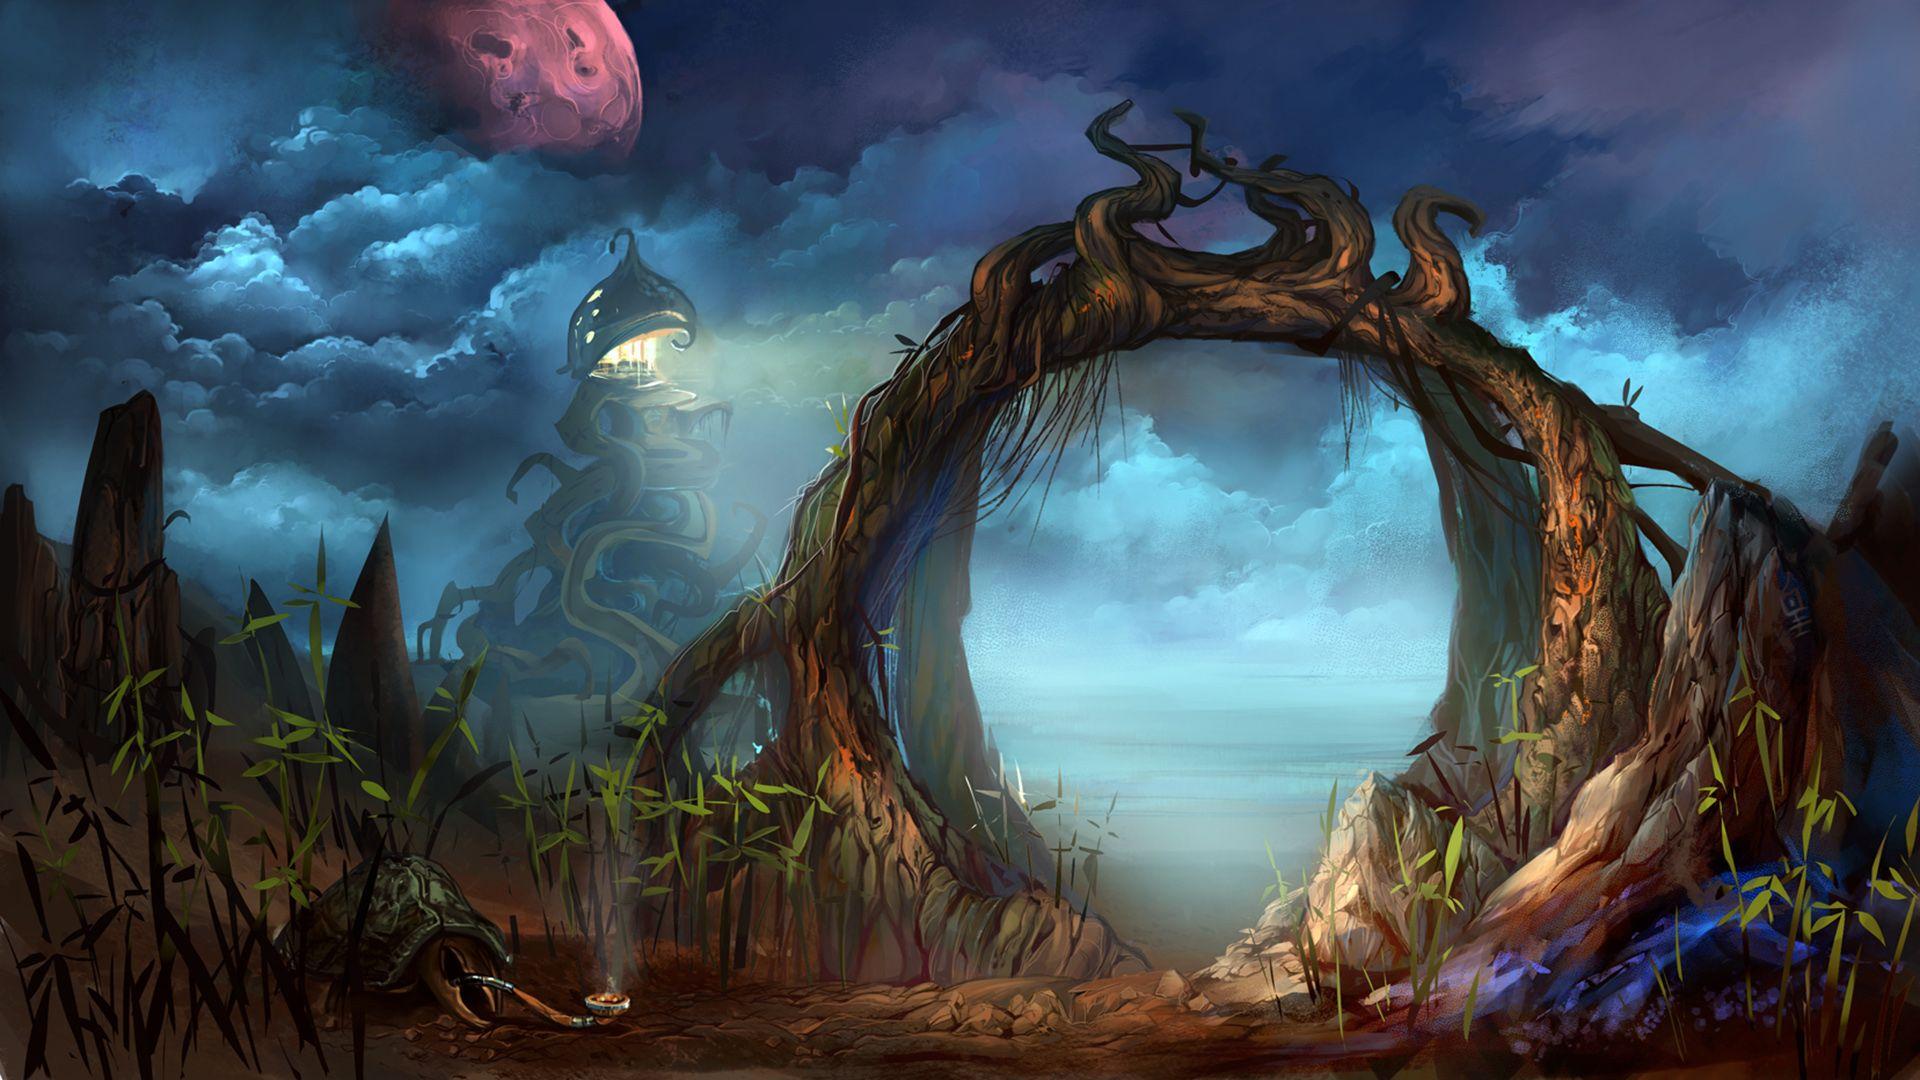 Video Game The Elder Scrolls Iii Morrowind Wallpaper